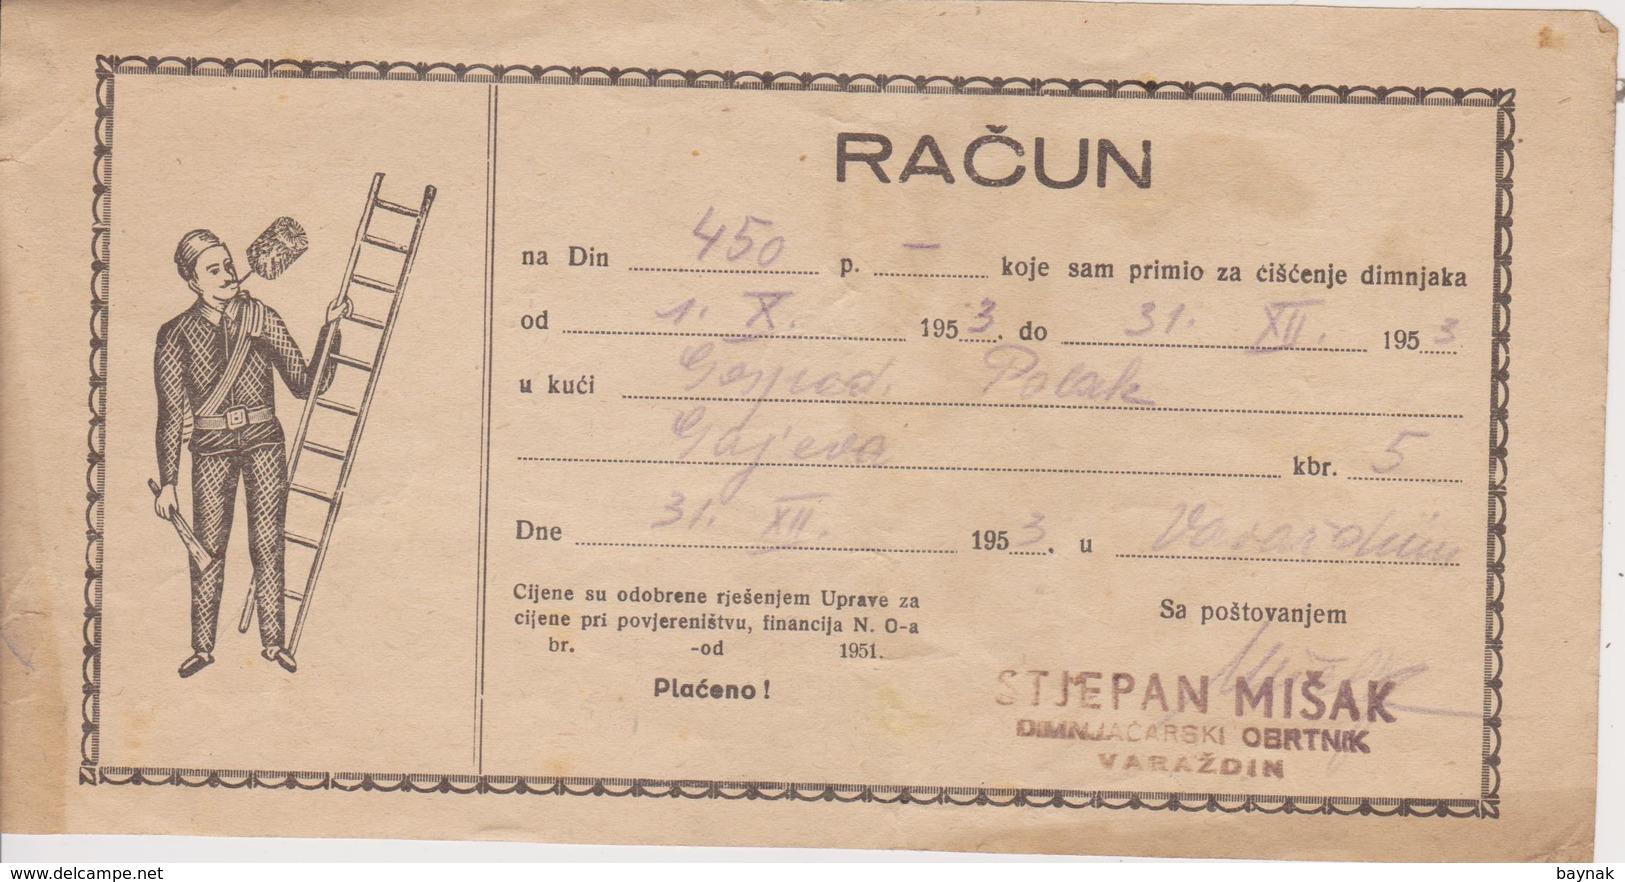 CROATIA  --  VARAZDIN  --  FACTURE, INVOICE,  RACUN  ~  1953  --  STJEPAN MISAK  --  DIMNJACAR, MONEUR, CHIMNEY SWEEP - Facturas & Documentos Mercantiles